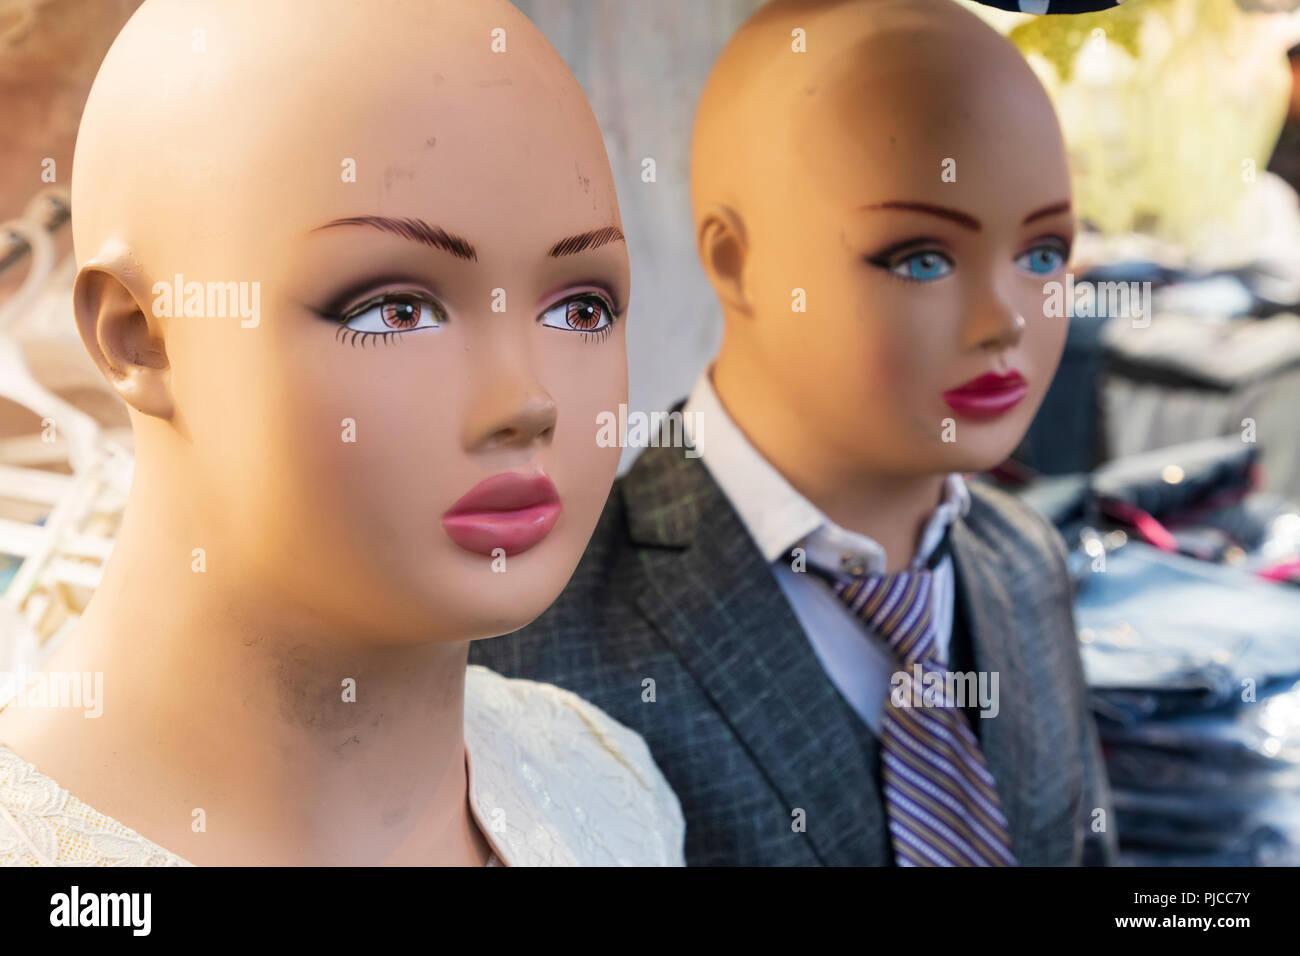 Islamic Republic of Iran. Bald Mannequin heads. Stock Photo